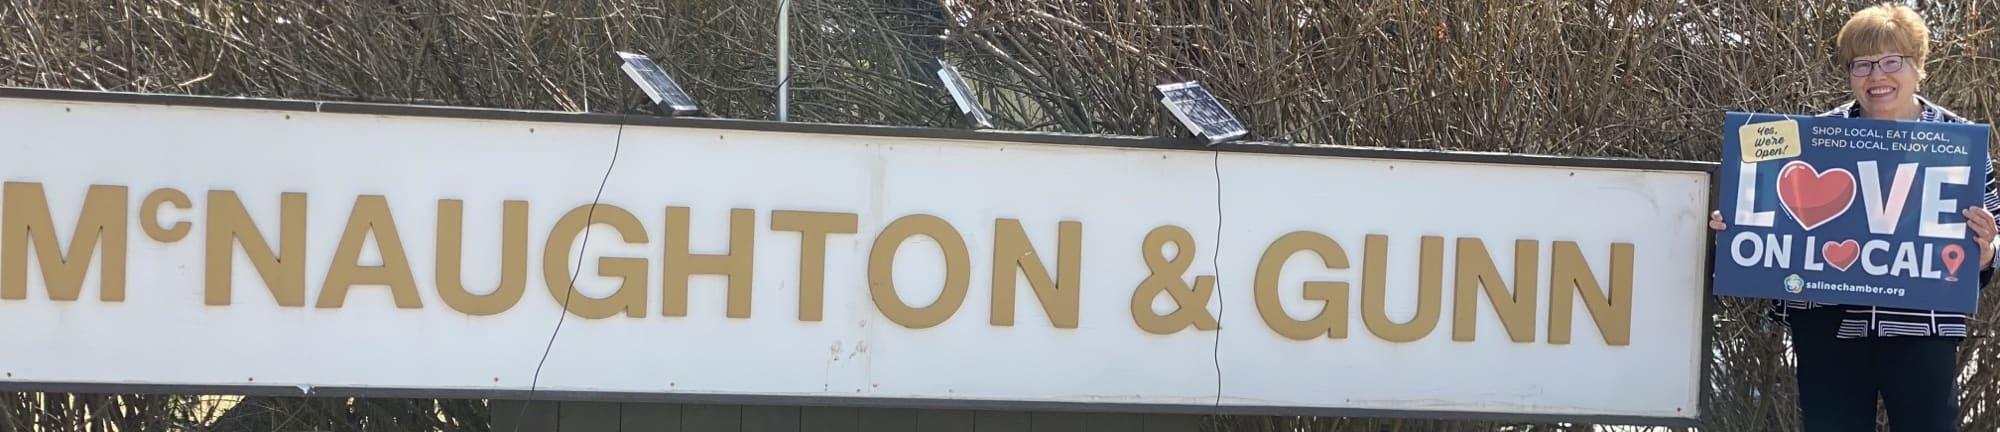 McNaughton-and-Gunn-w2000.jpg